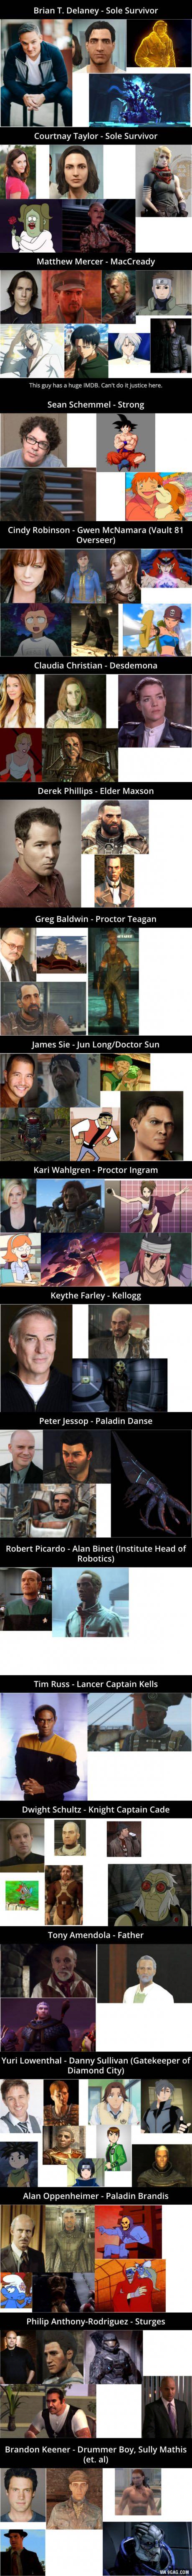 The Voice Actors of Fallout 4. Danny Sullivan played Mercury, whoa